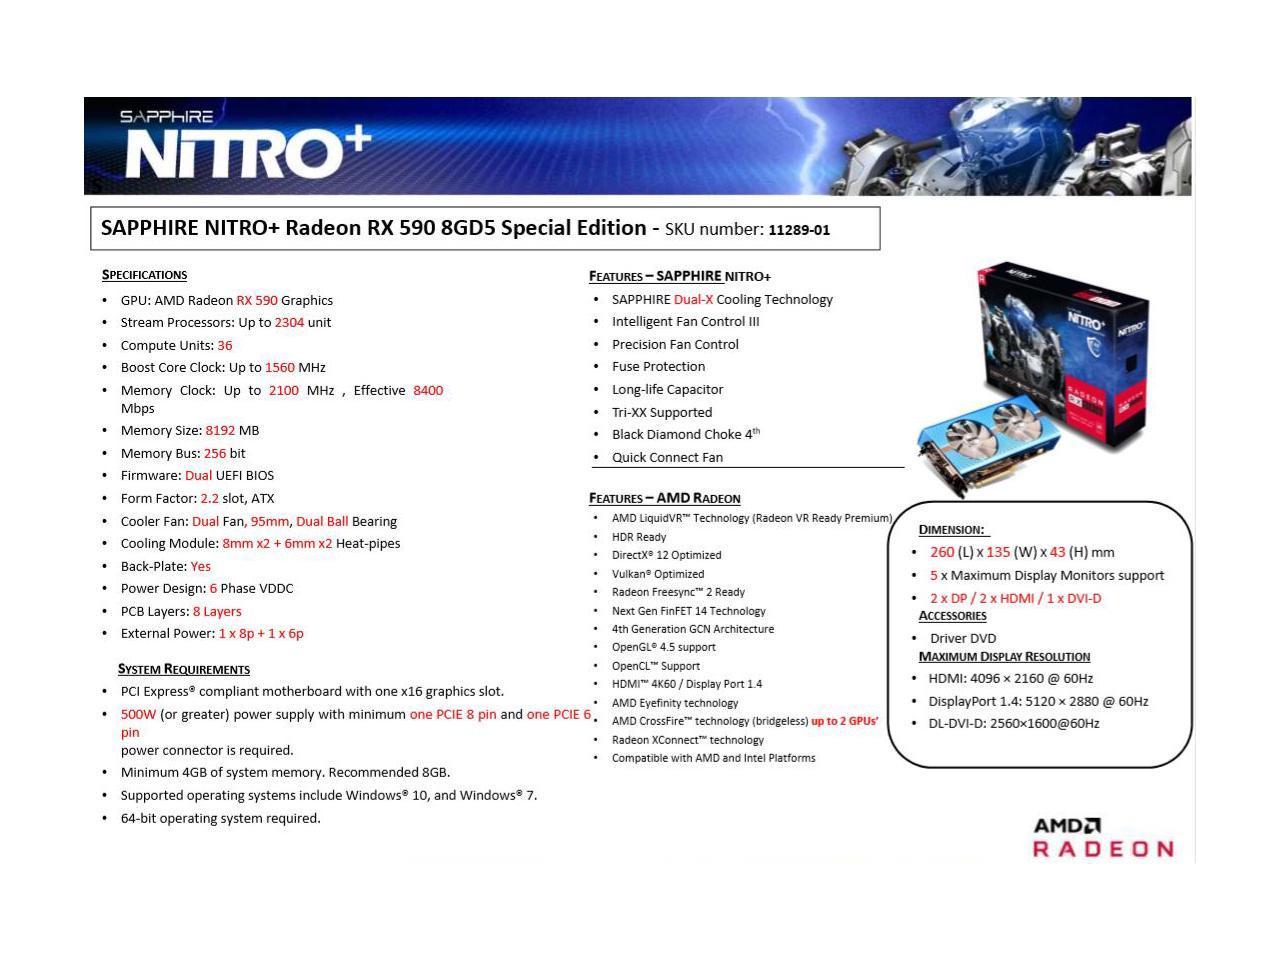 Появились фото видеокарты Sapphire RadeonRX 590 Nitro+ Special Edition